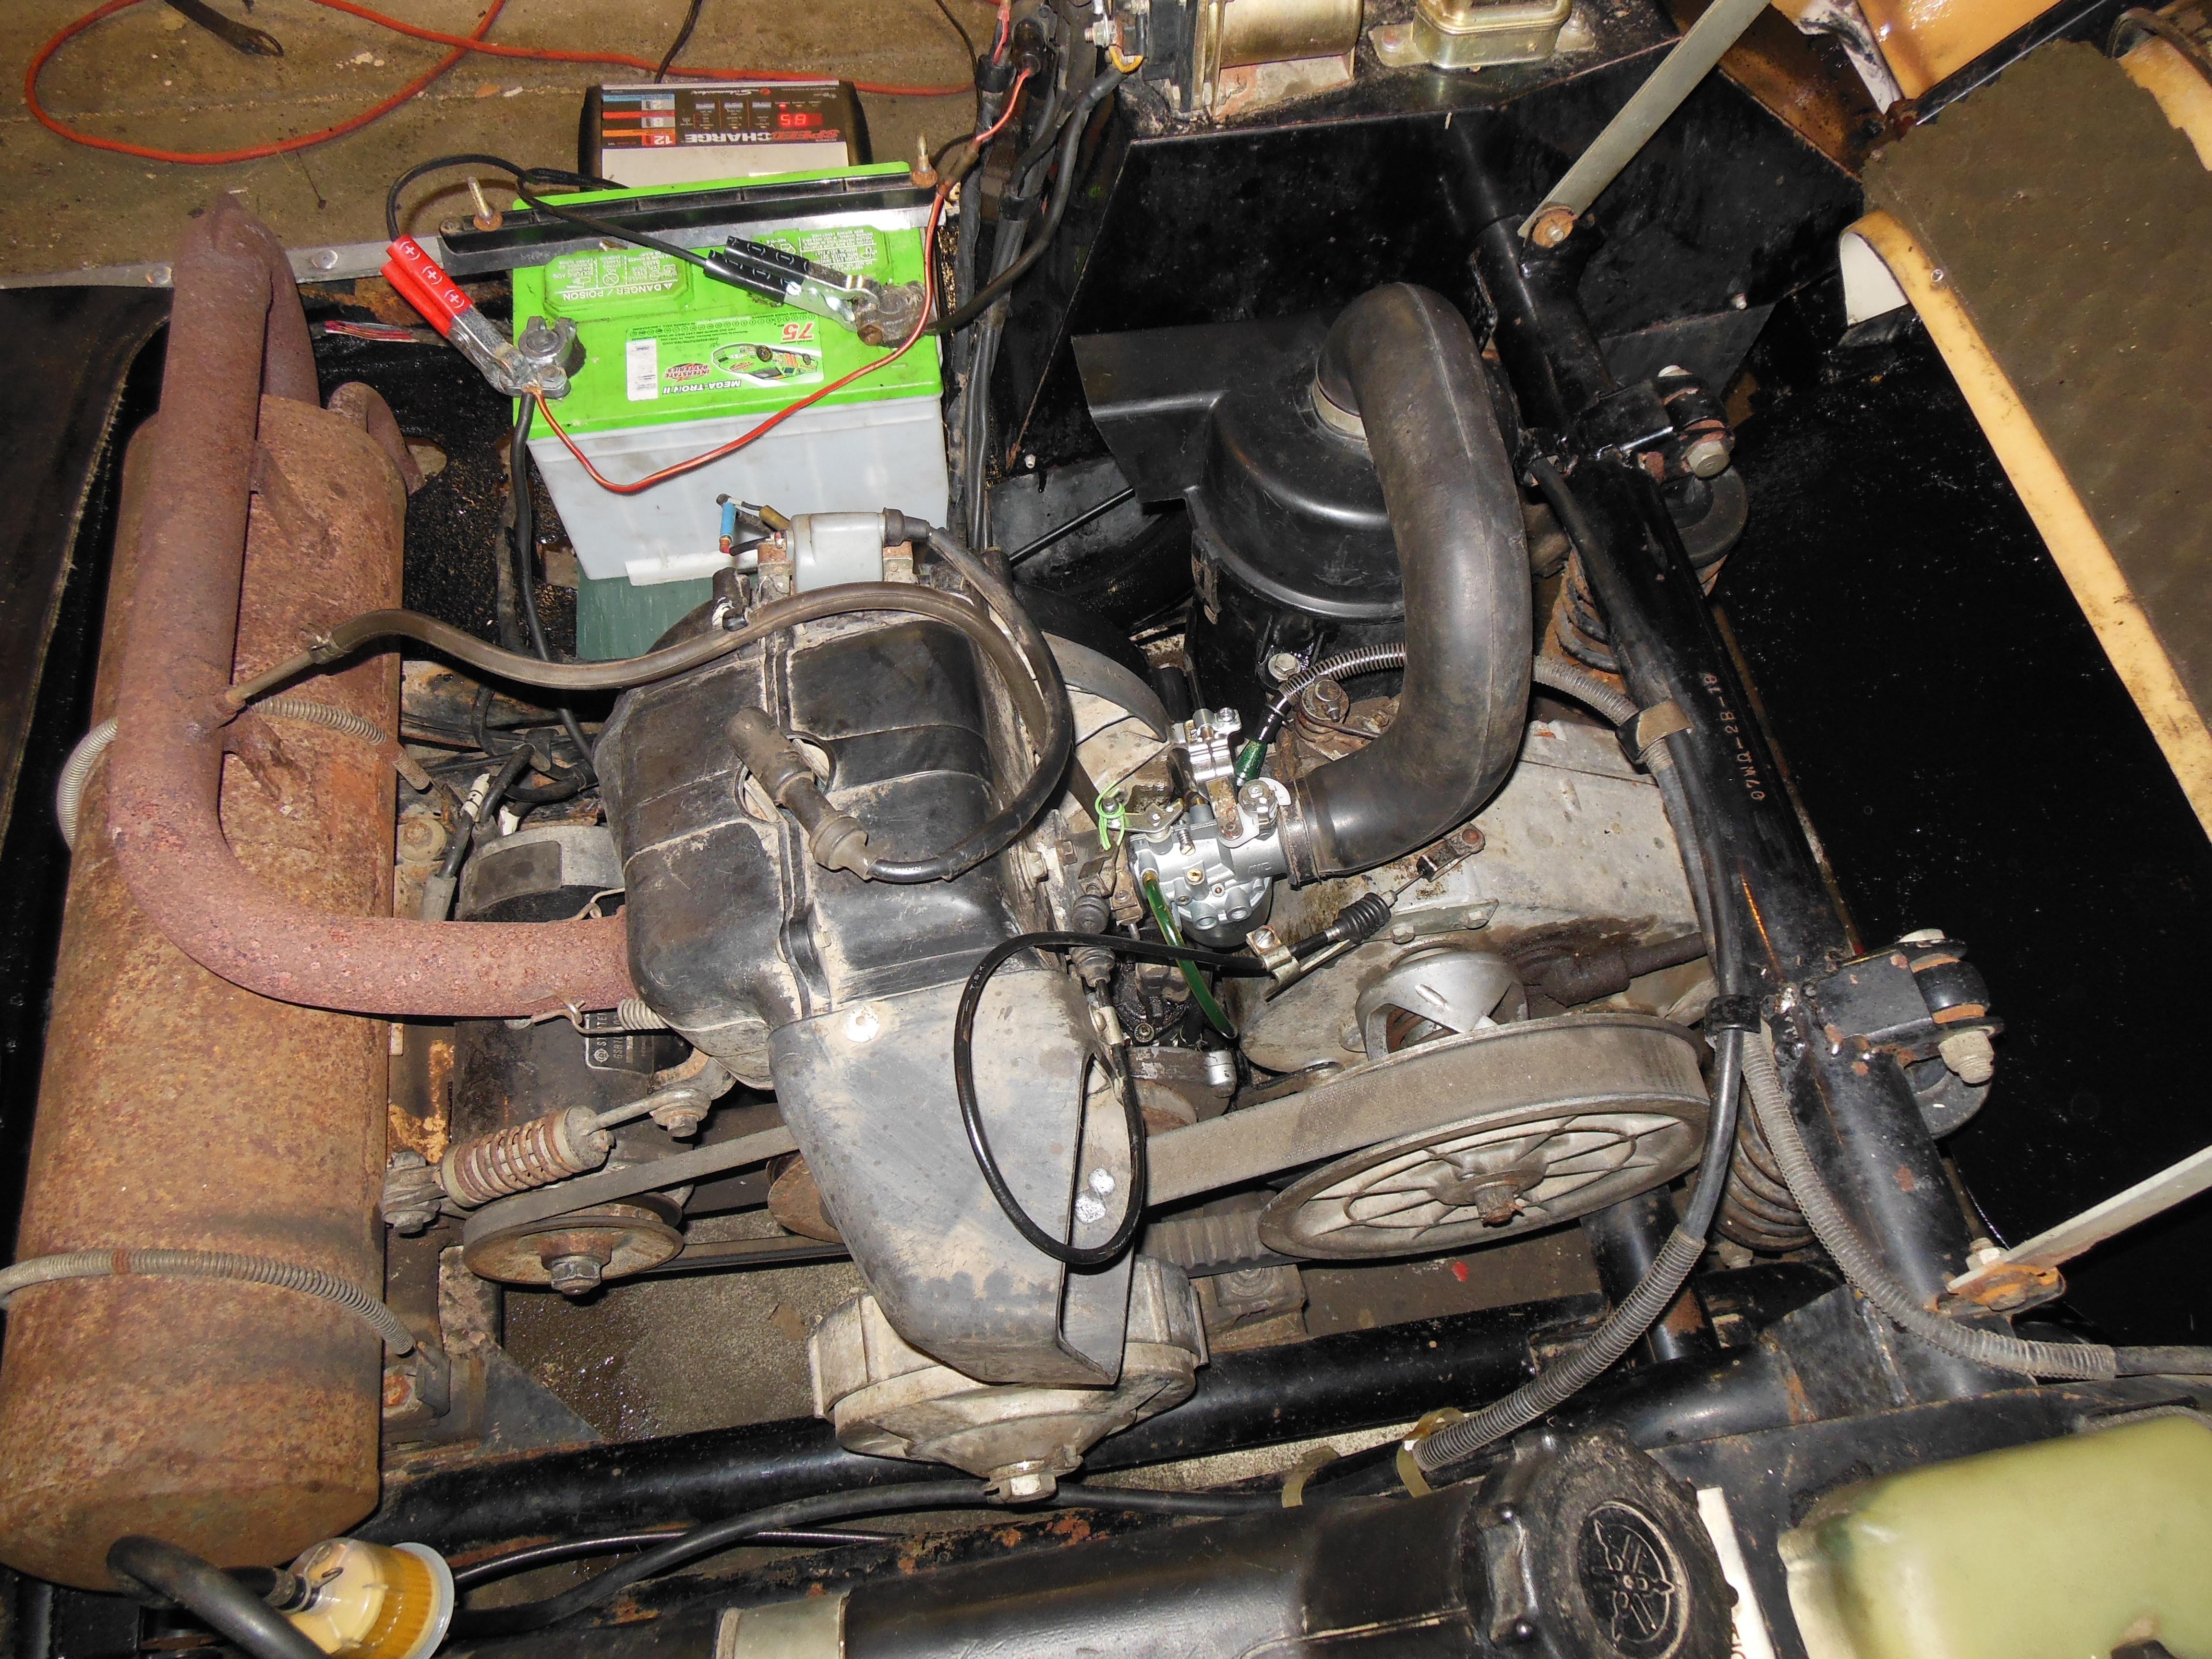 1983 ez go golf cart wiring diagram with Golfcart on Watch further Winch Solenoid Switch Wiring Diagram furthermore 6c2h5 Hello 2003 Club Car Ds Ir 48v Golf Cart Cart in addition Lexus Es350 Fuse Diagram additionally 94 Club Car Ignition Wiring Diagram.